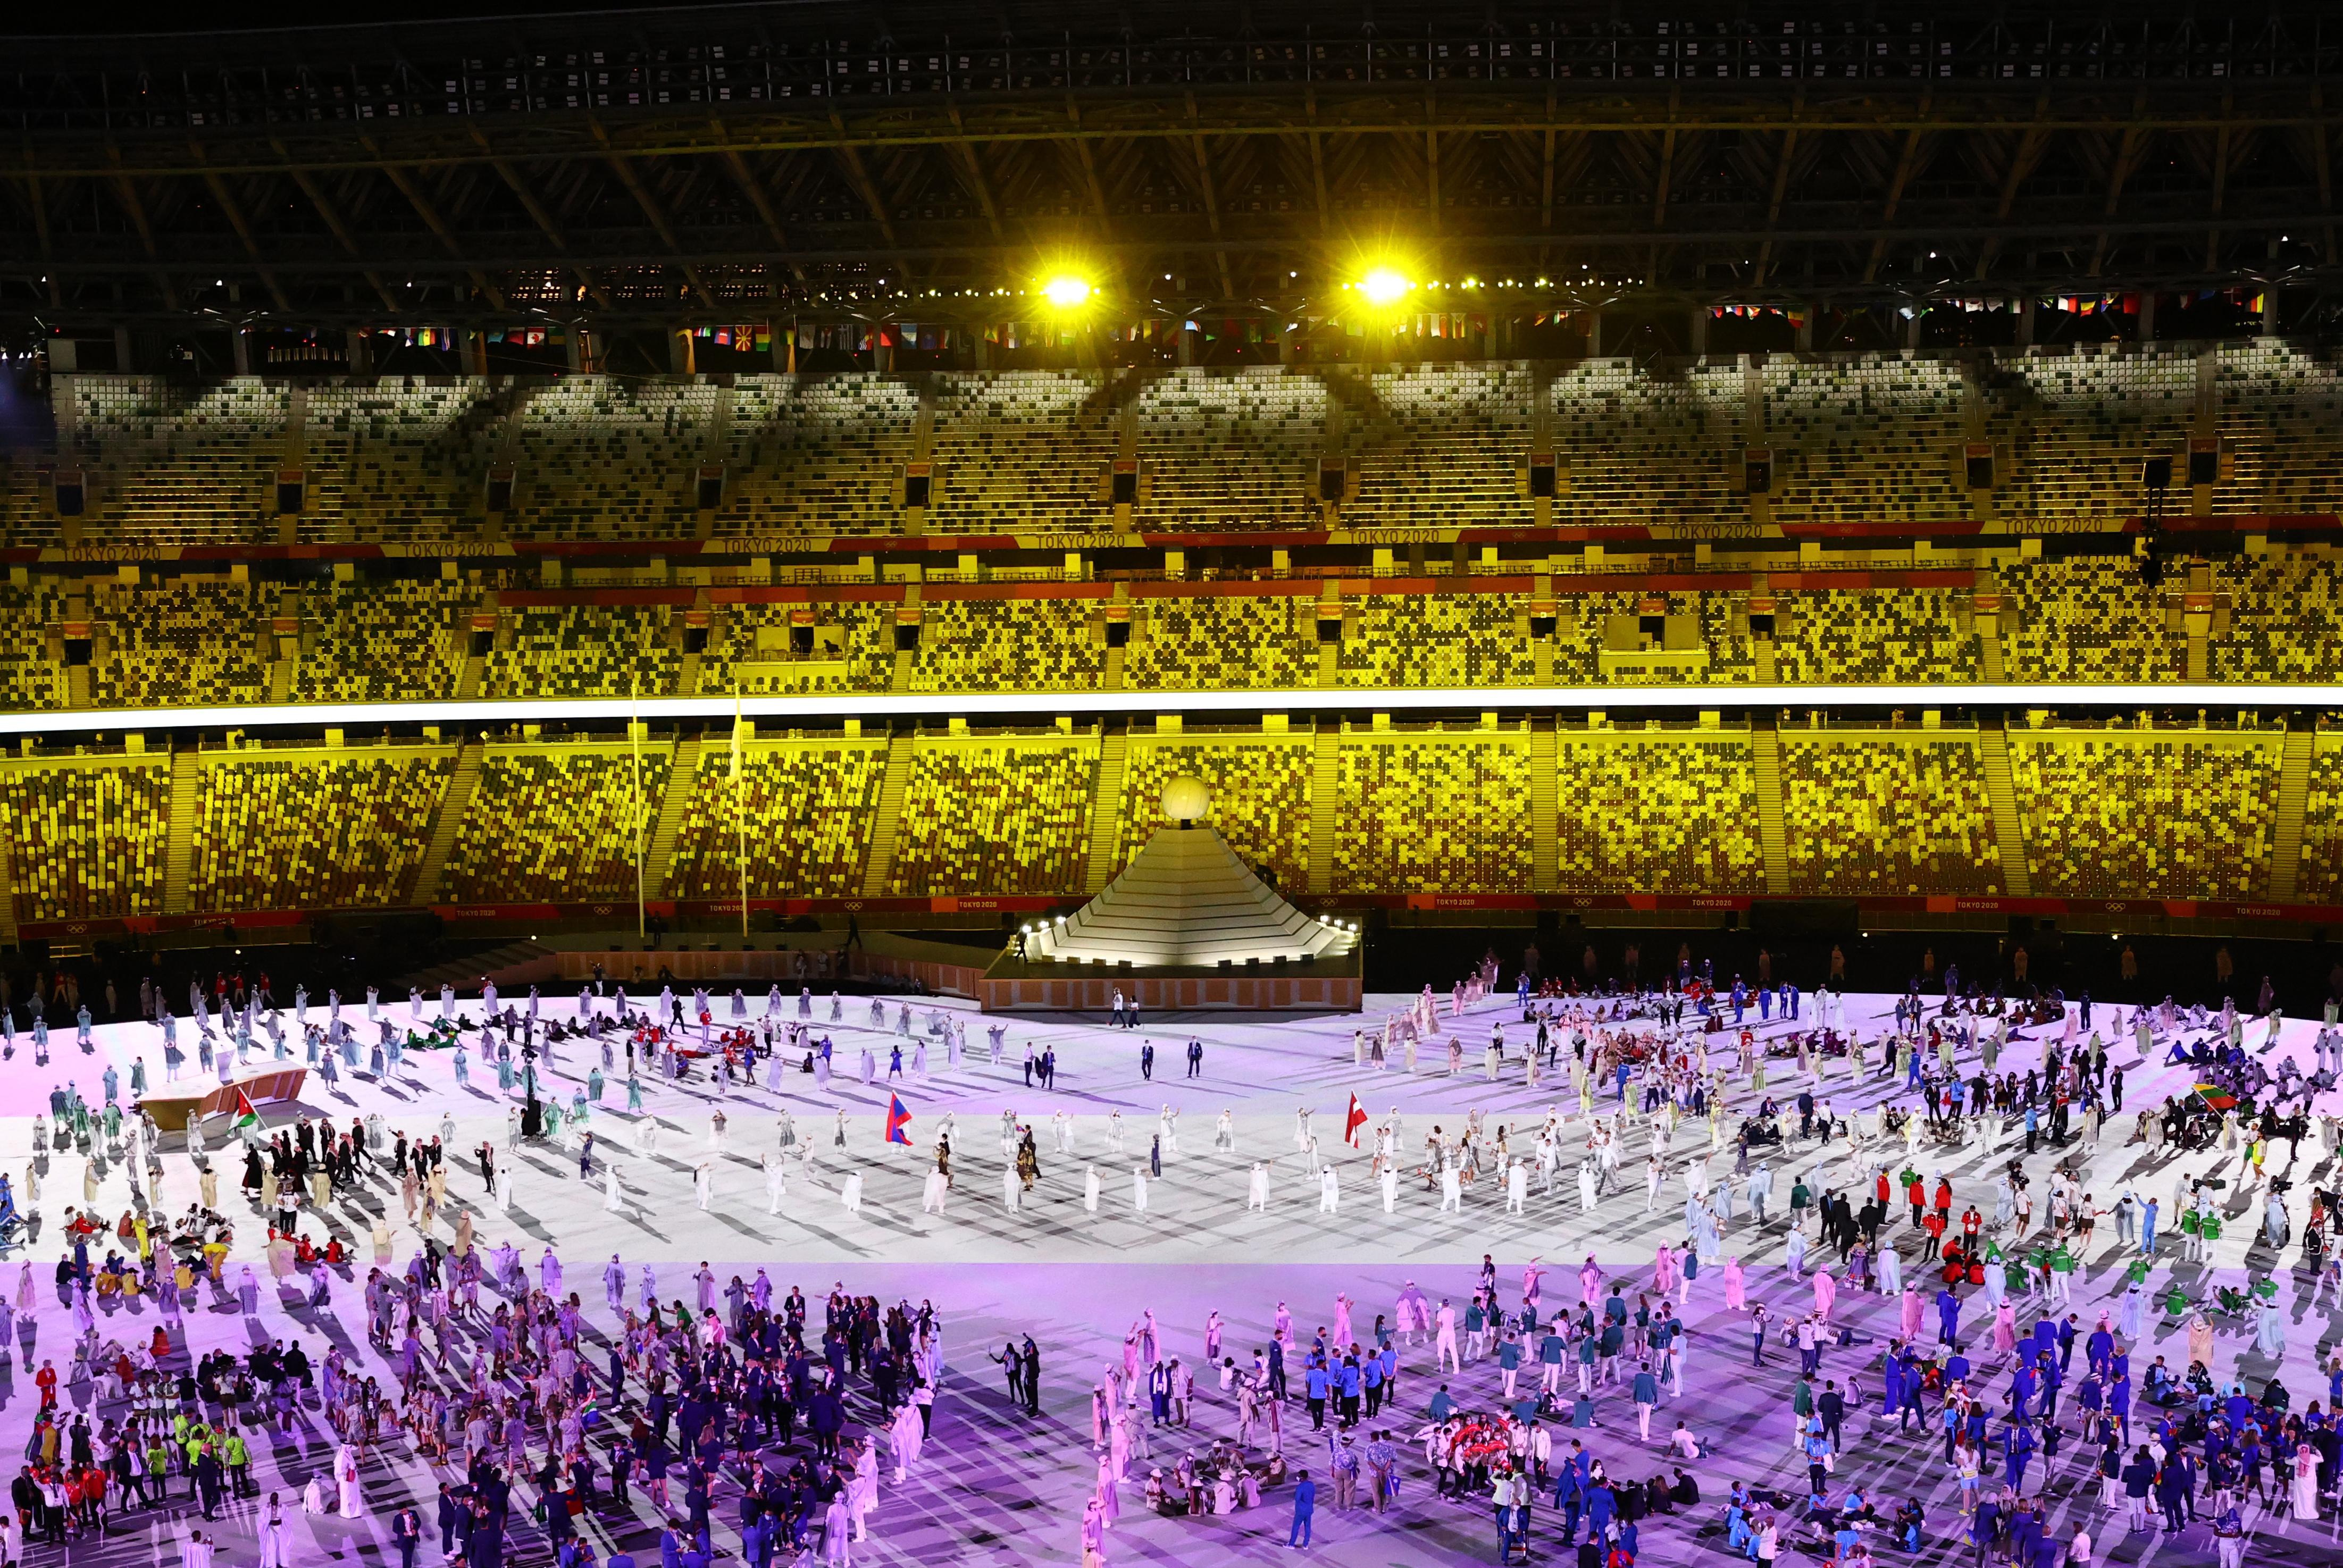 Tokyo 2020 Olympics - The Tokyo 2020 Olympics Opening Ceremony - Olympic Stadium, Tokyo, Japan - July 23, 2021. Athletes enter the stadium during the opening ceremony REUTERS/Marko Djurica